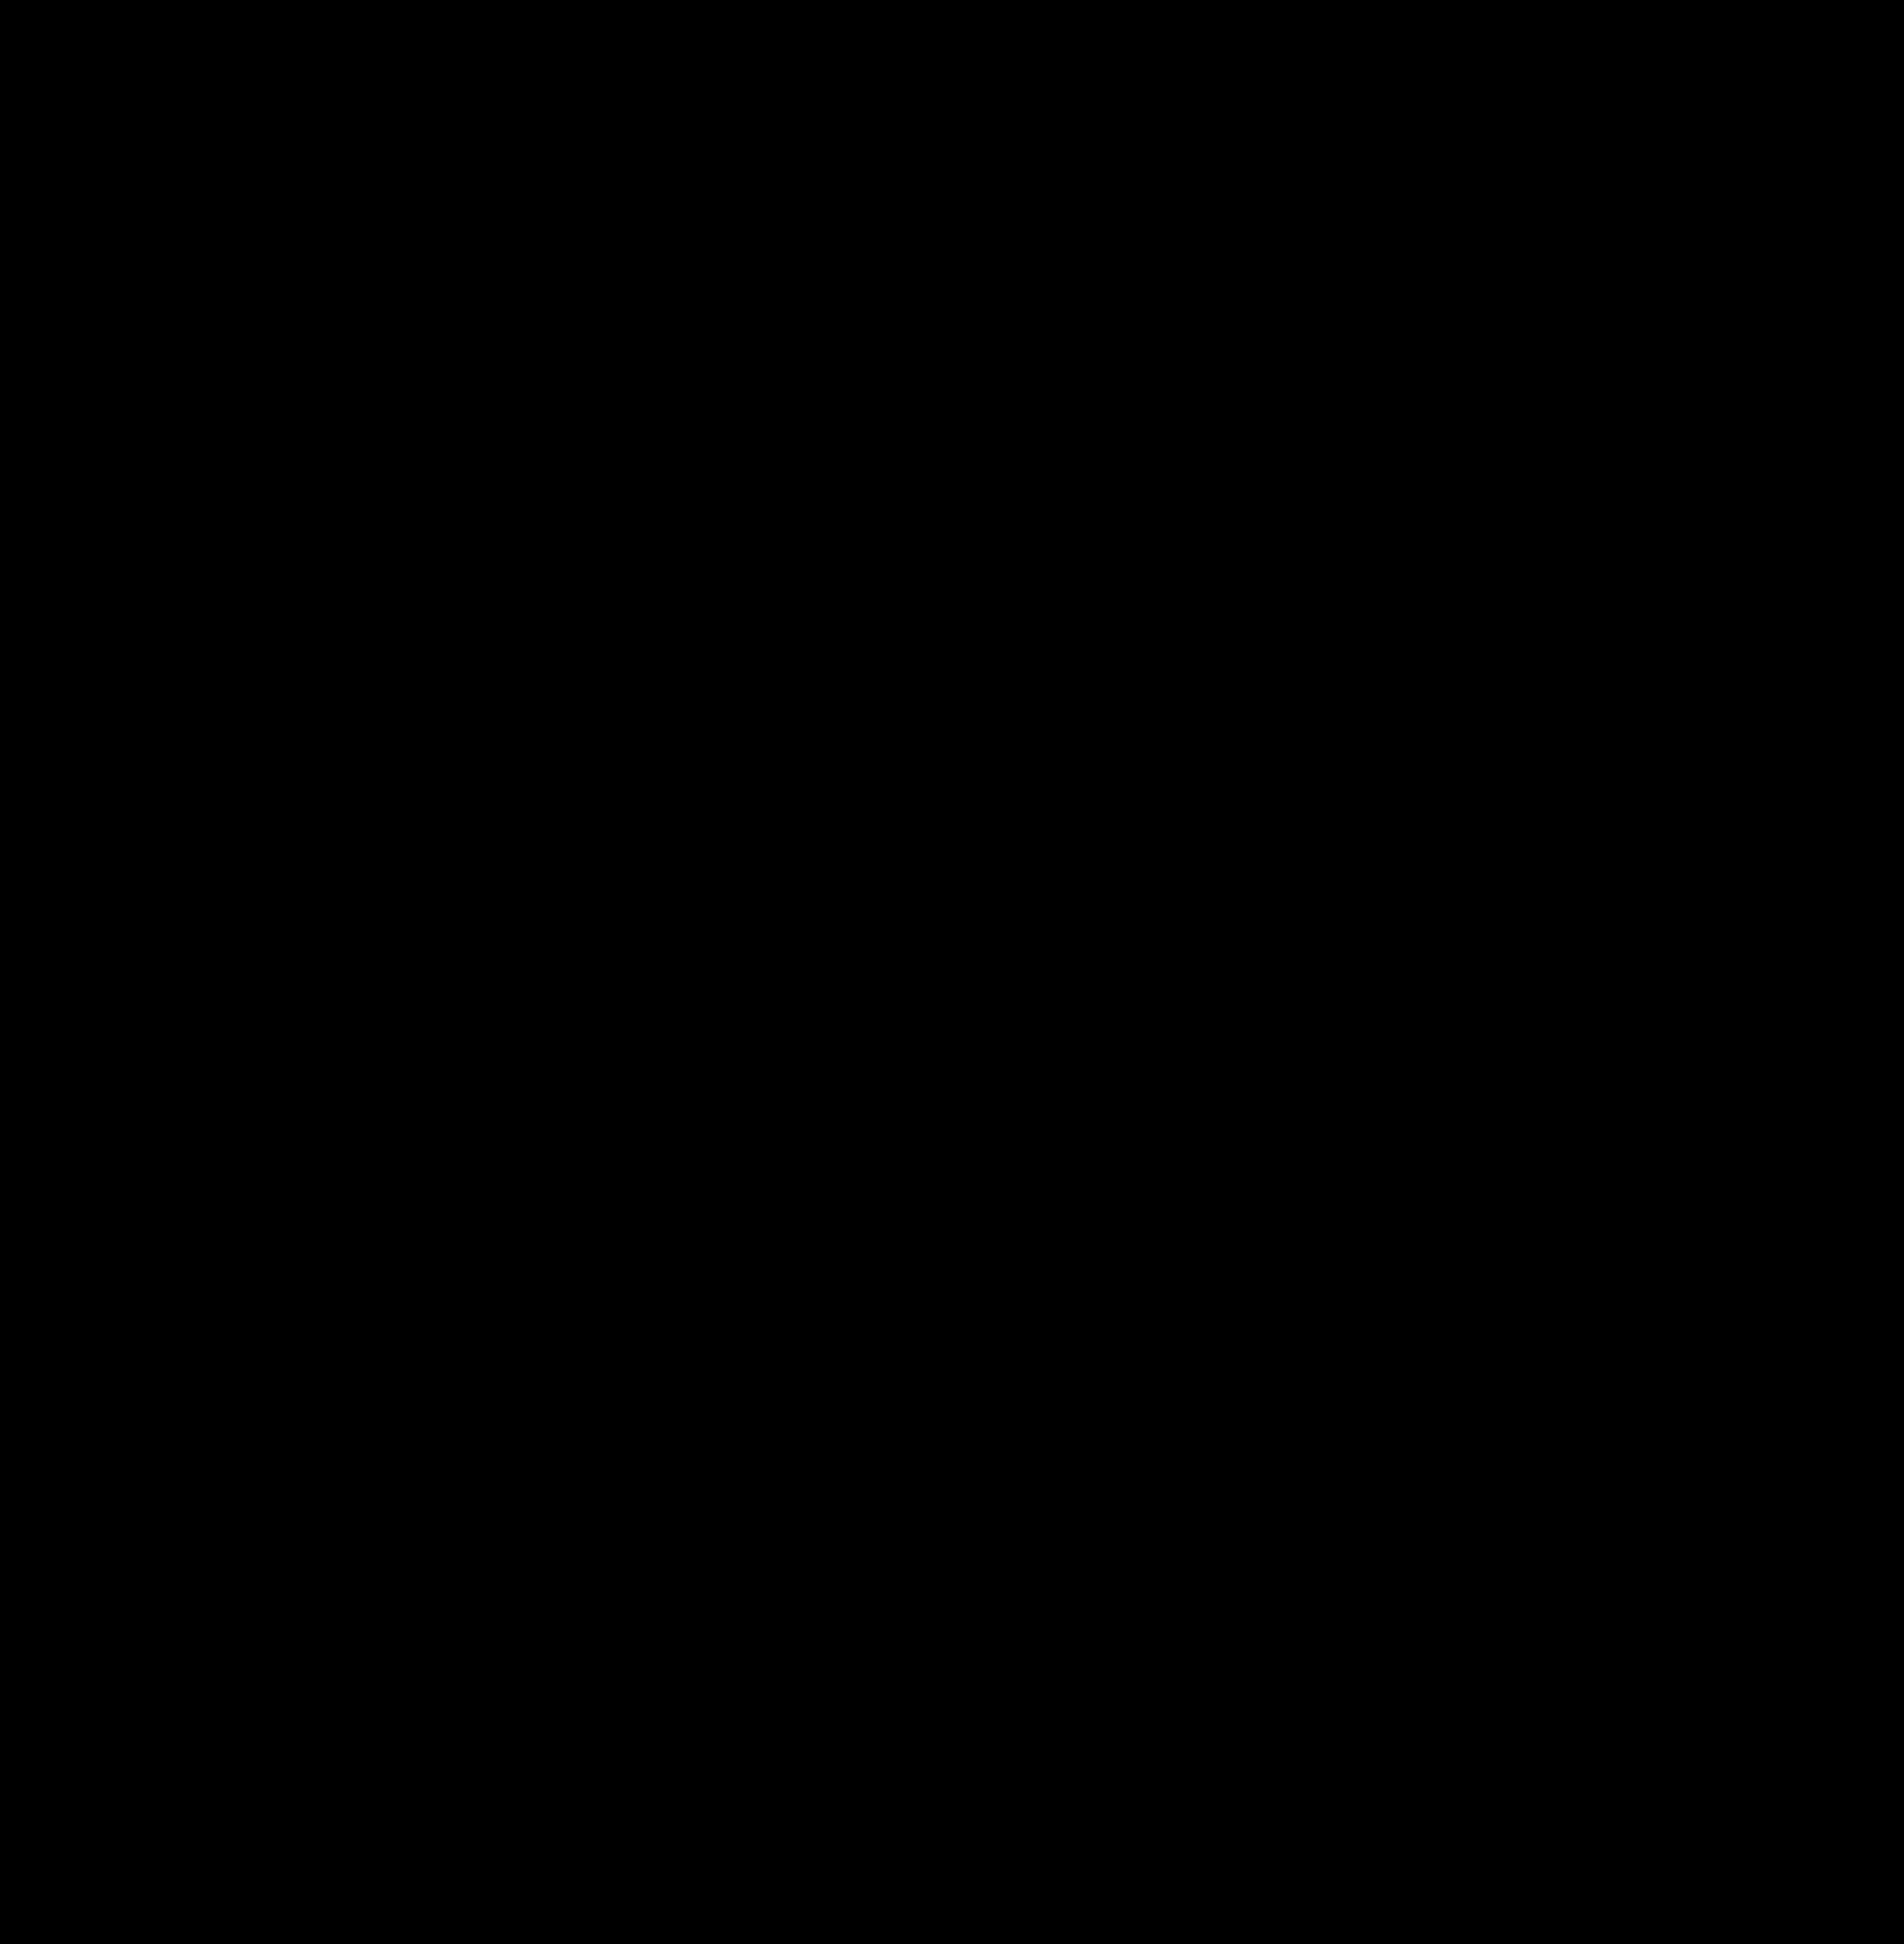 Clipart rose vector. Tudor